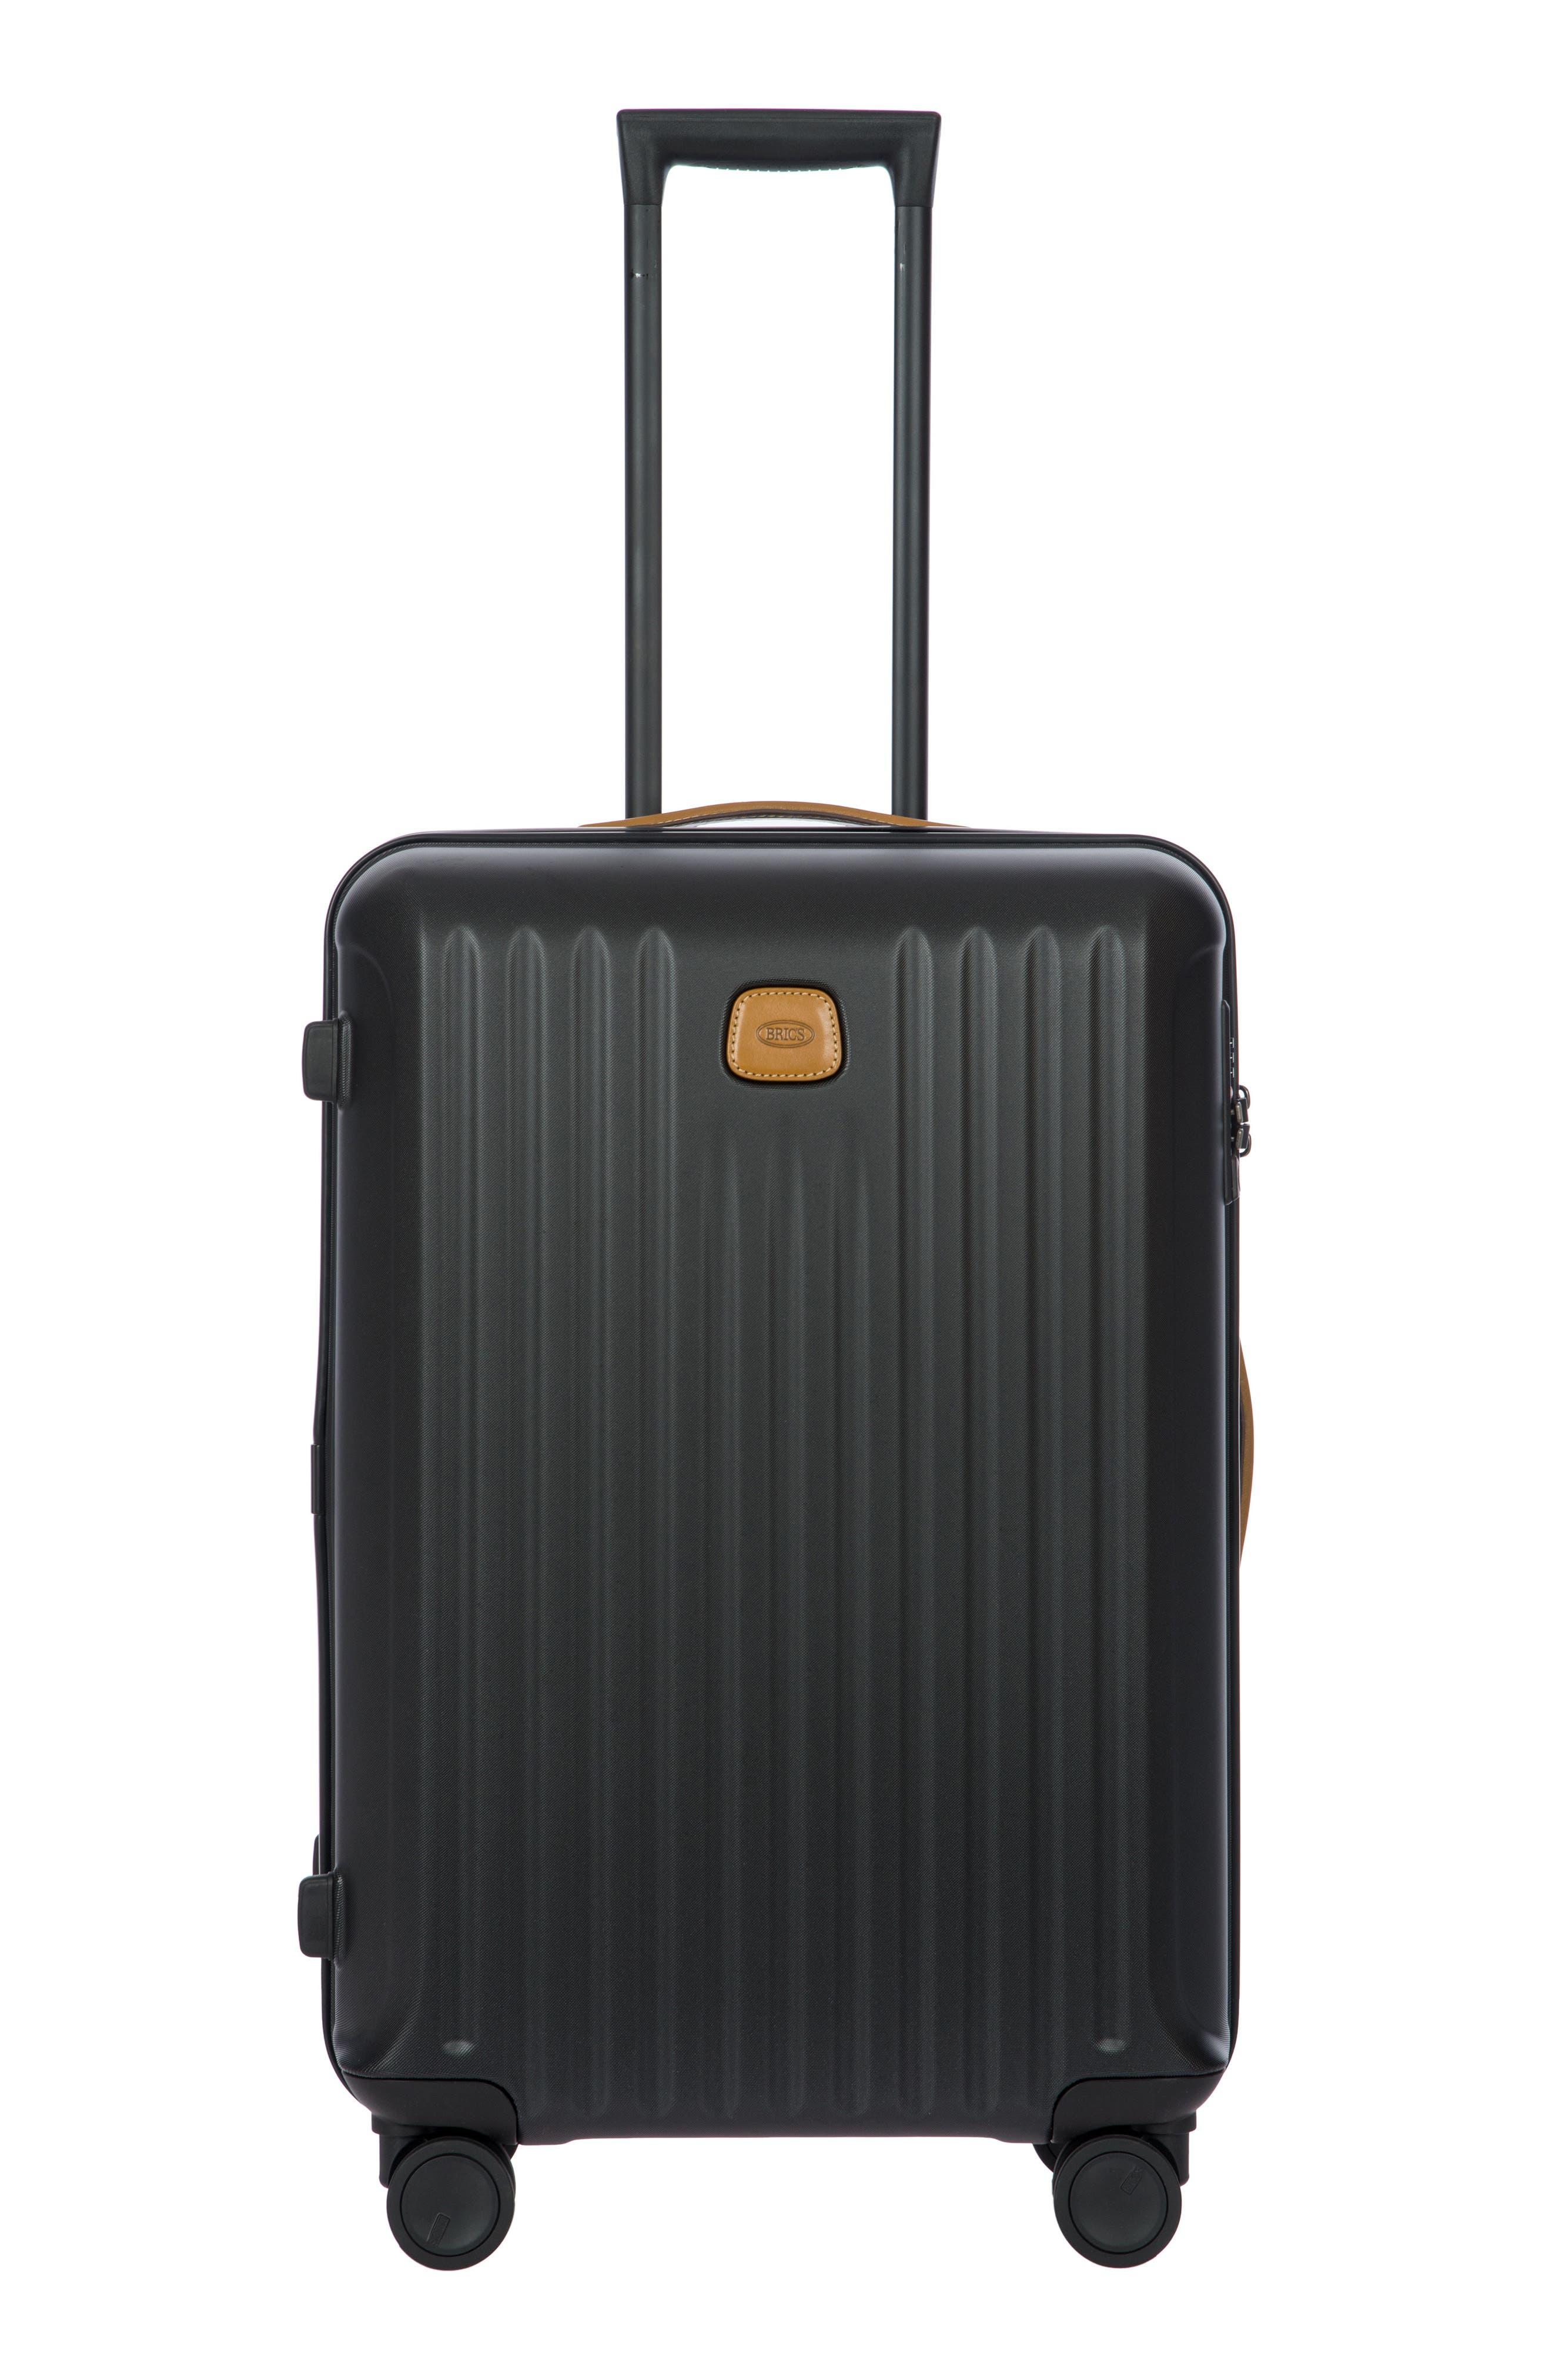 Capri 27-Inch Rolling Suitcase - Black in Matte Black